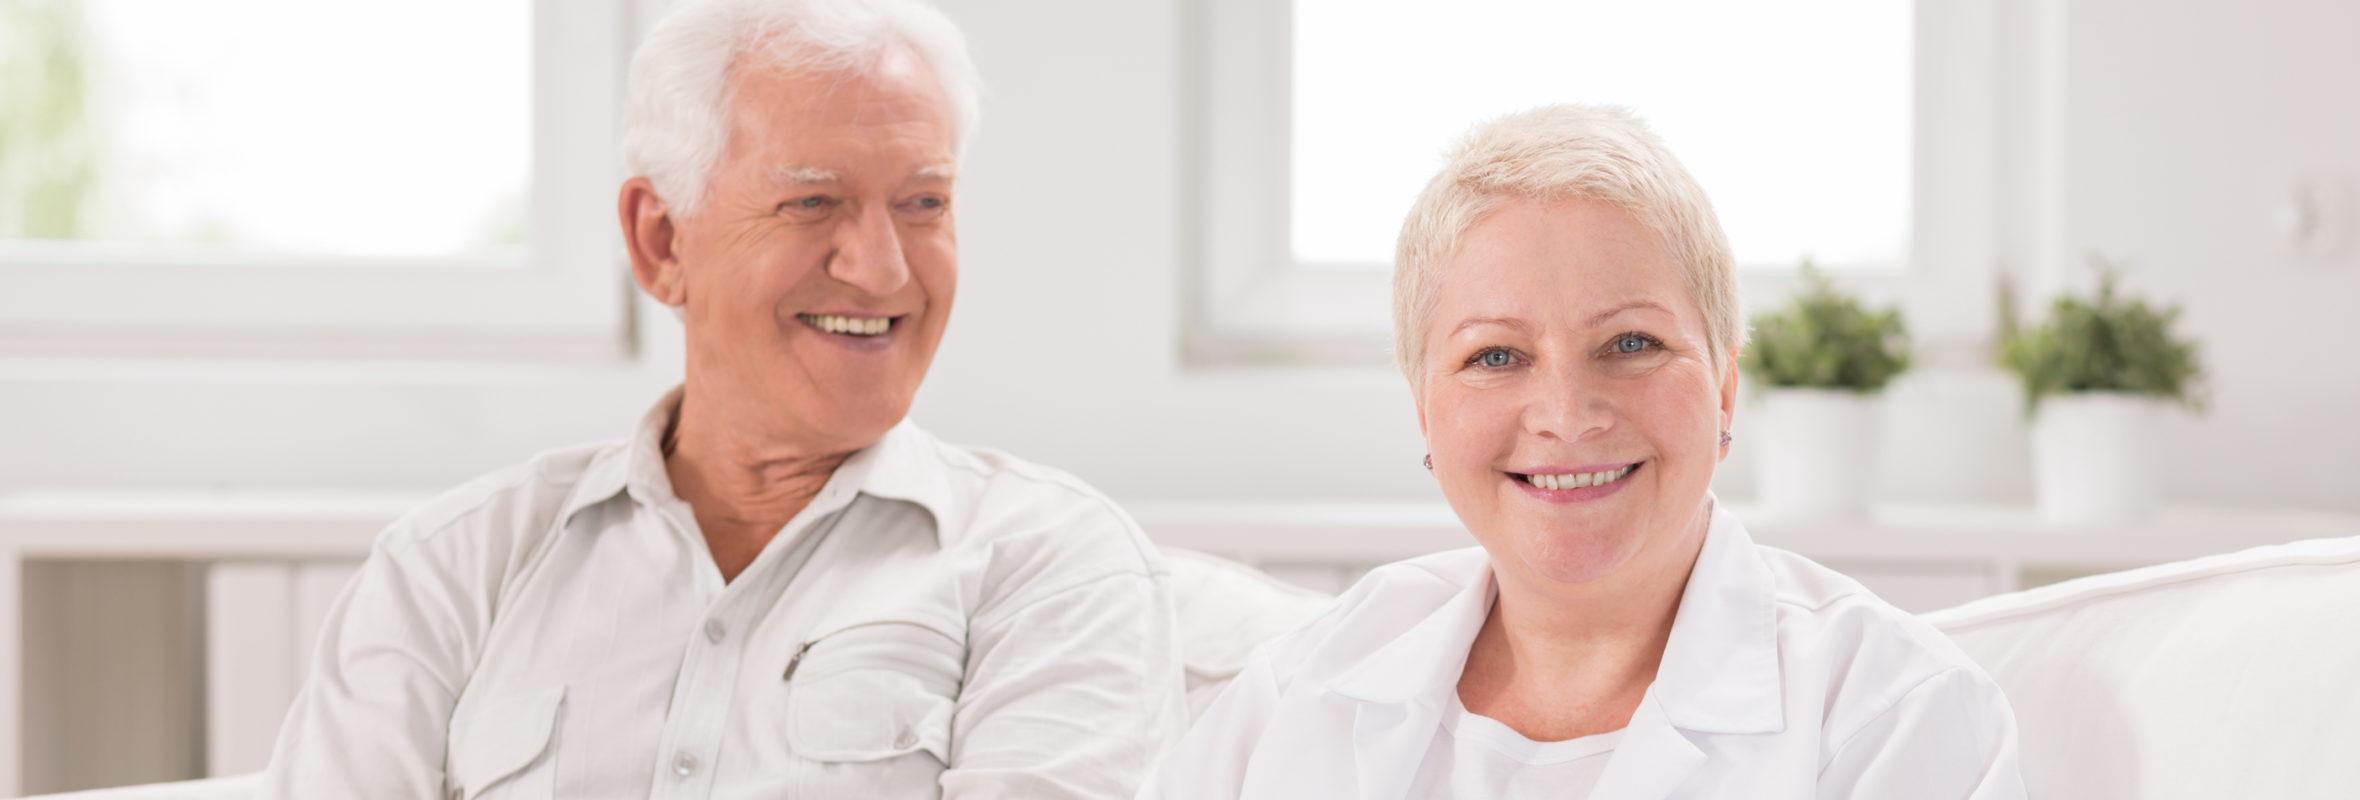 Dental Implants - Senior man and adult nurse in white